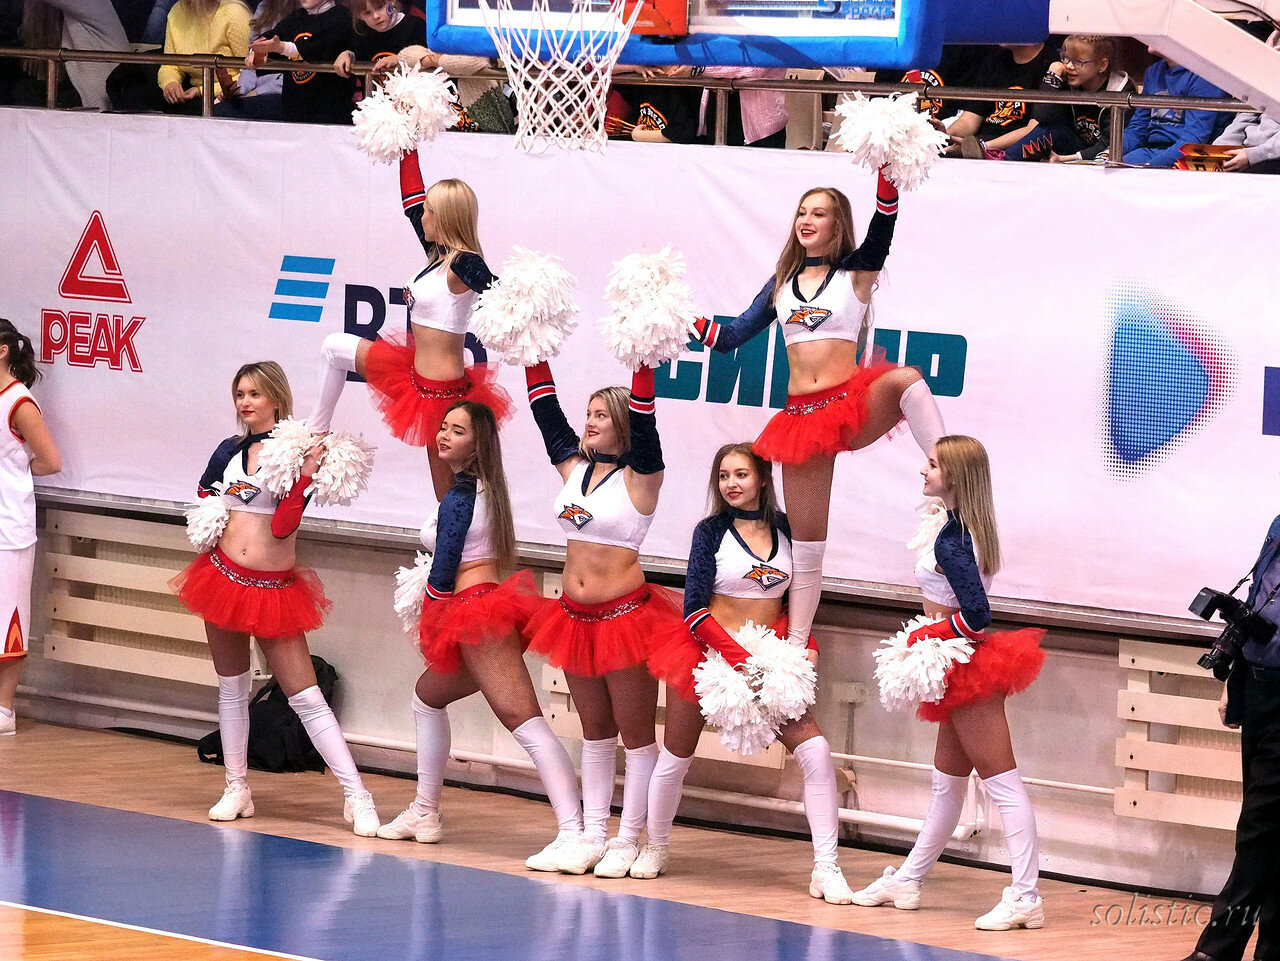 106 Матч звезд АСБ 2018 (ассоциации студенческого баскетбола)